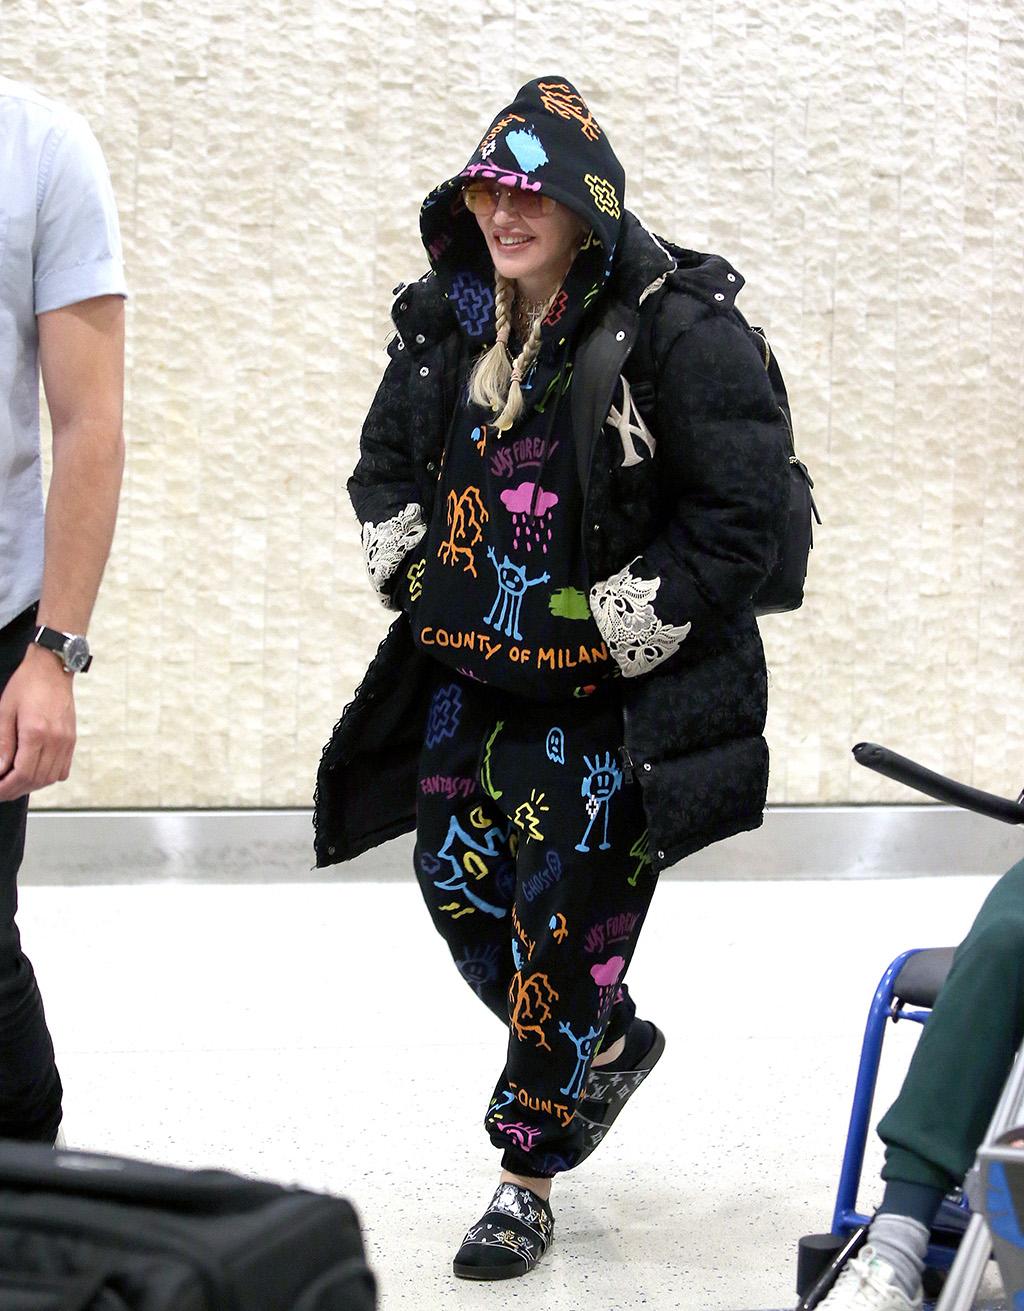 Madonna Louis Vuitton Birkenstock Street style